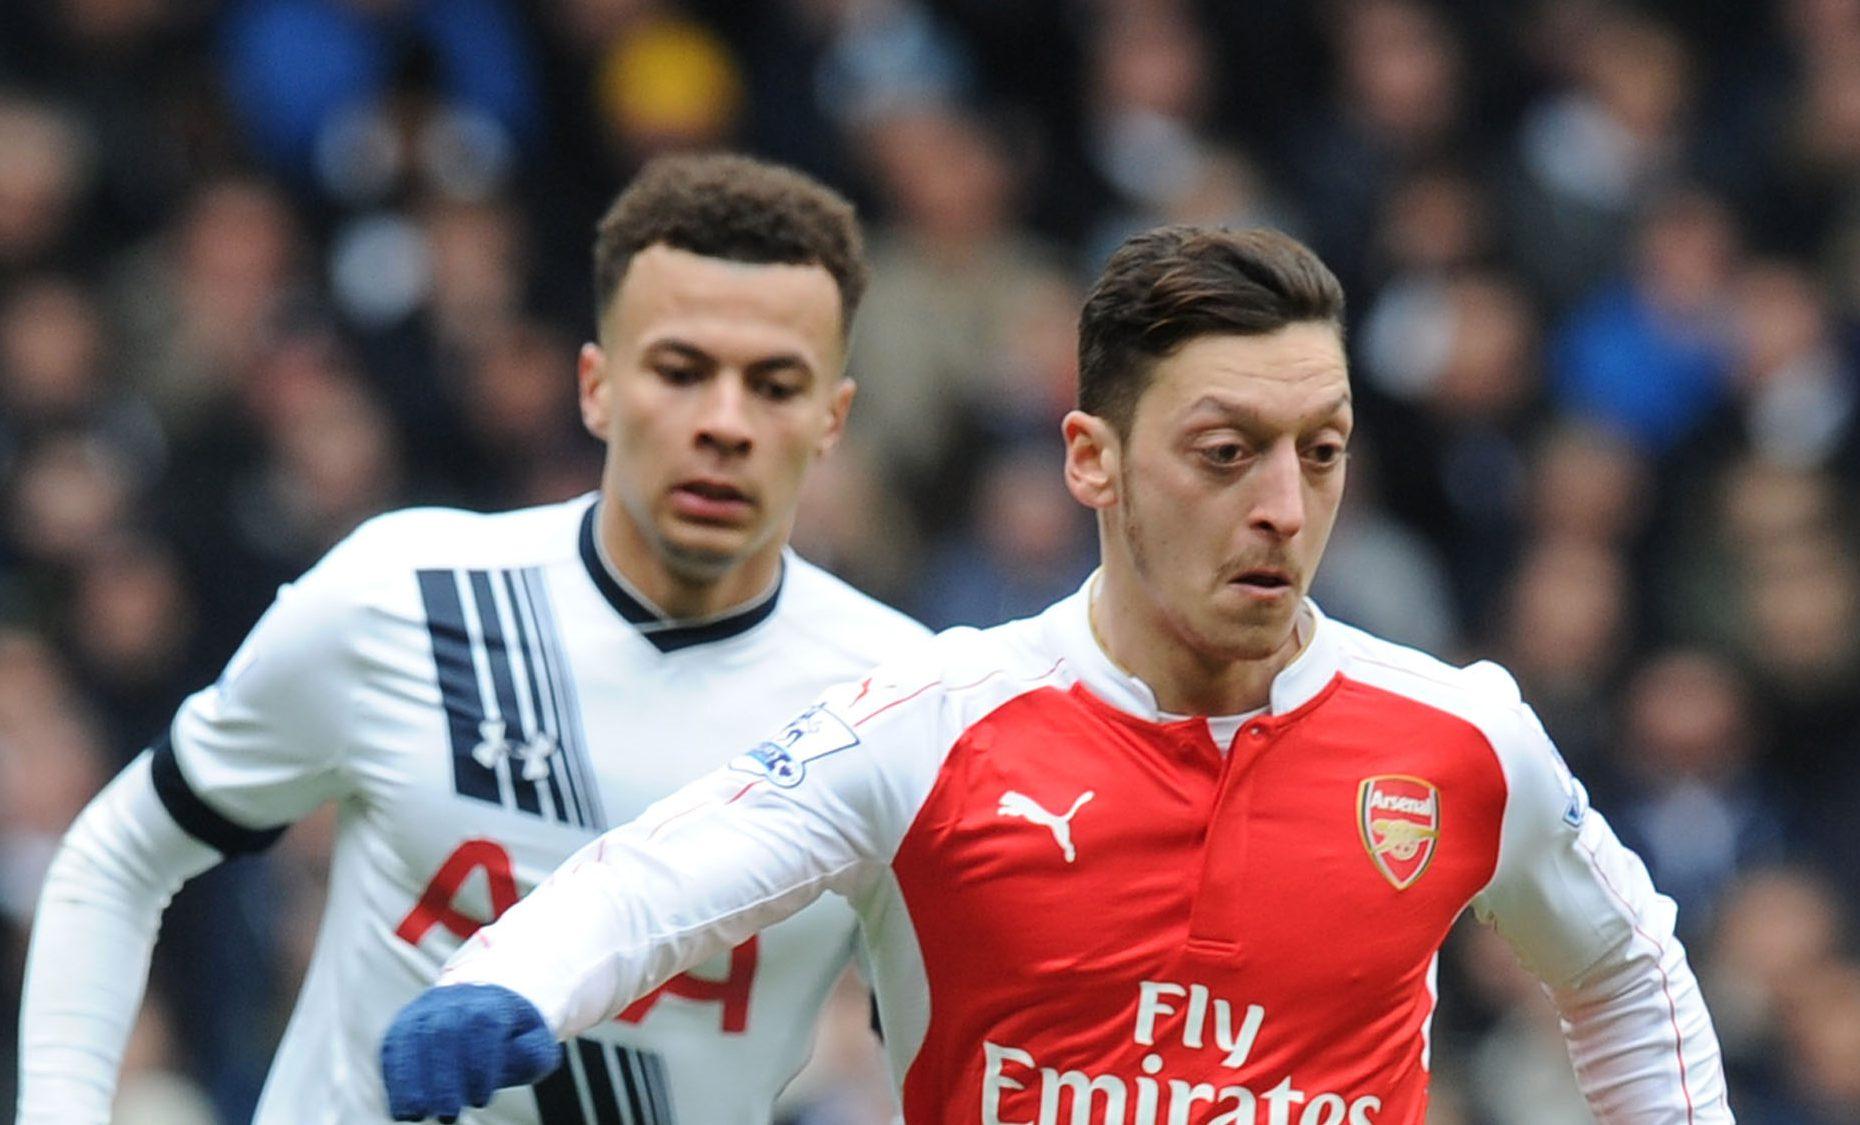 Mark Clattenburg to referee Arsenal's clash with Tottenham